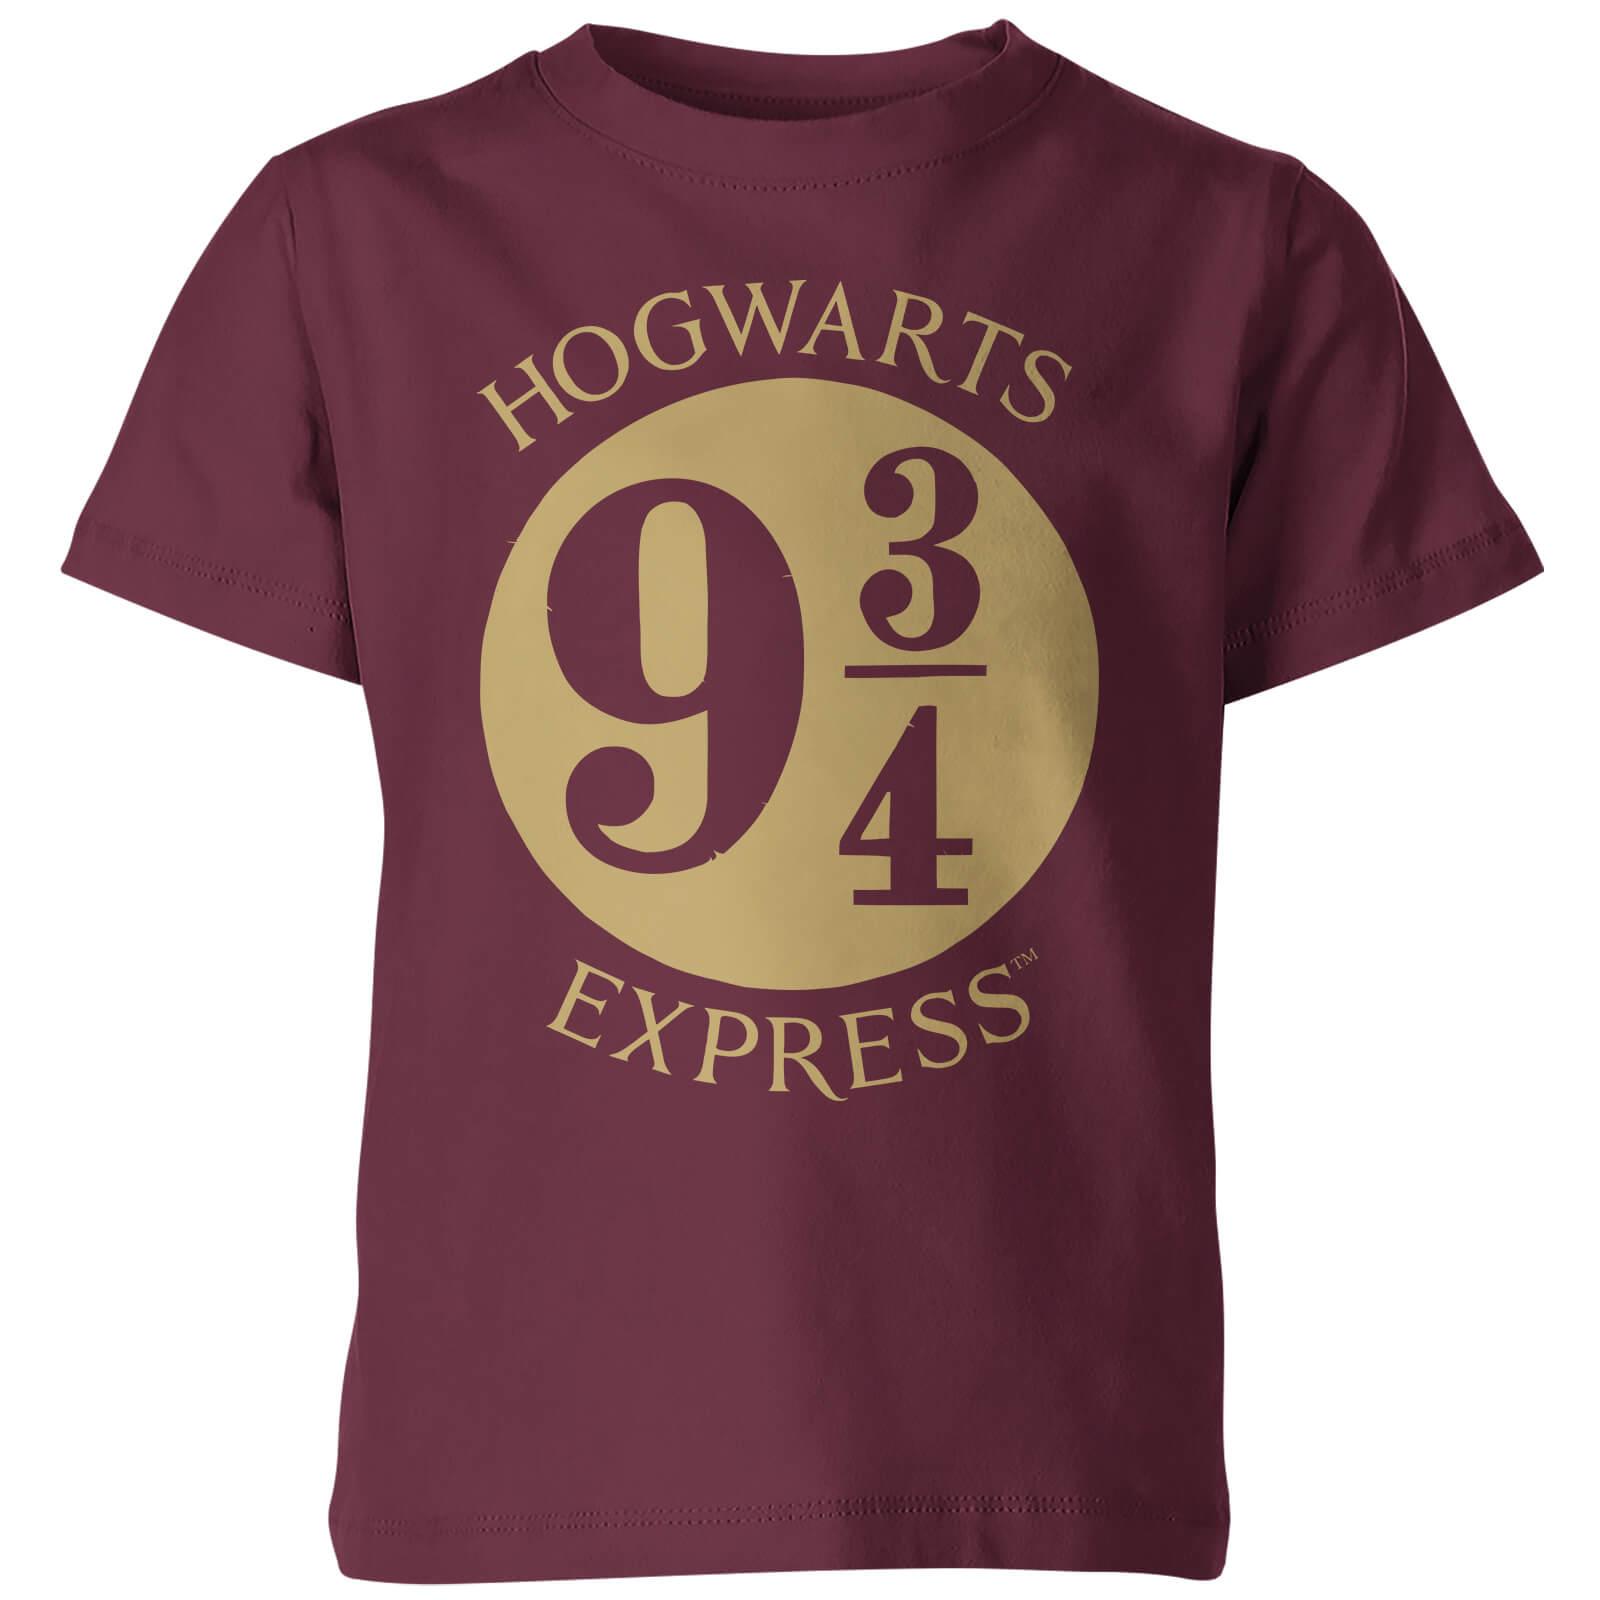 T shirt enfant plateforme 9 3 4 harry potter bordeaux for T shirt printing franchise